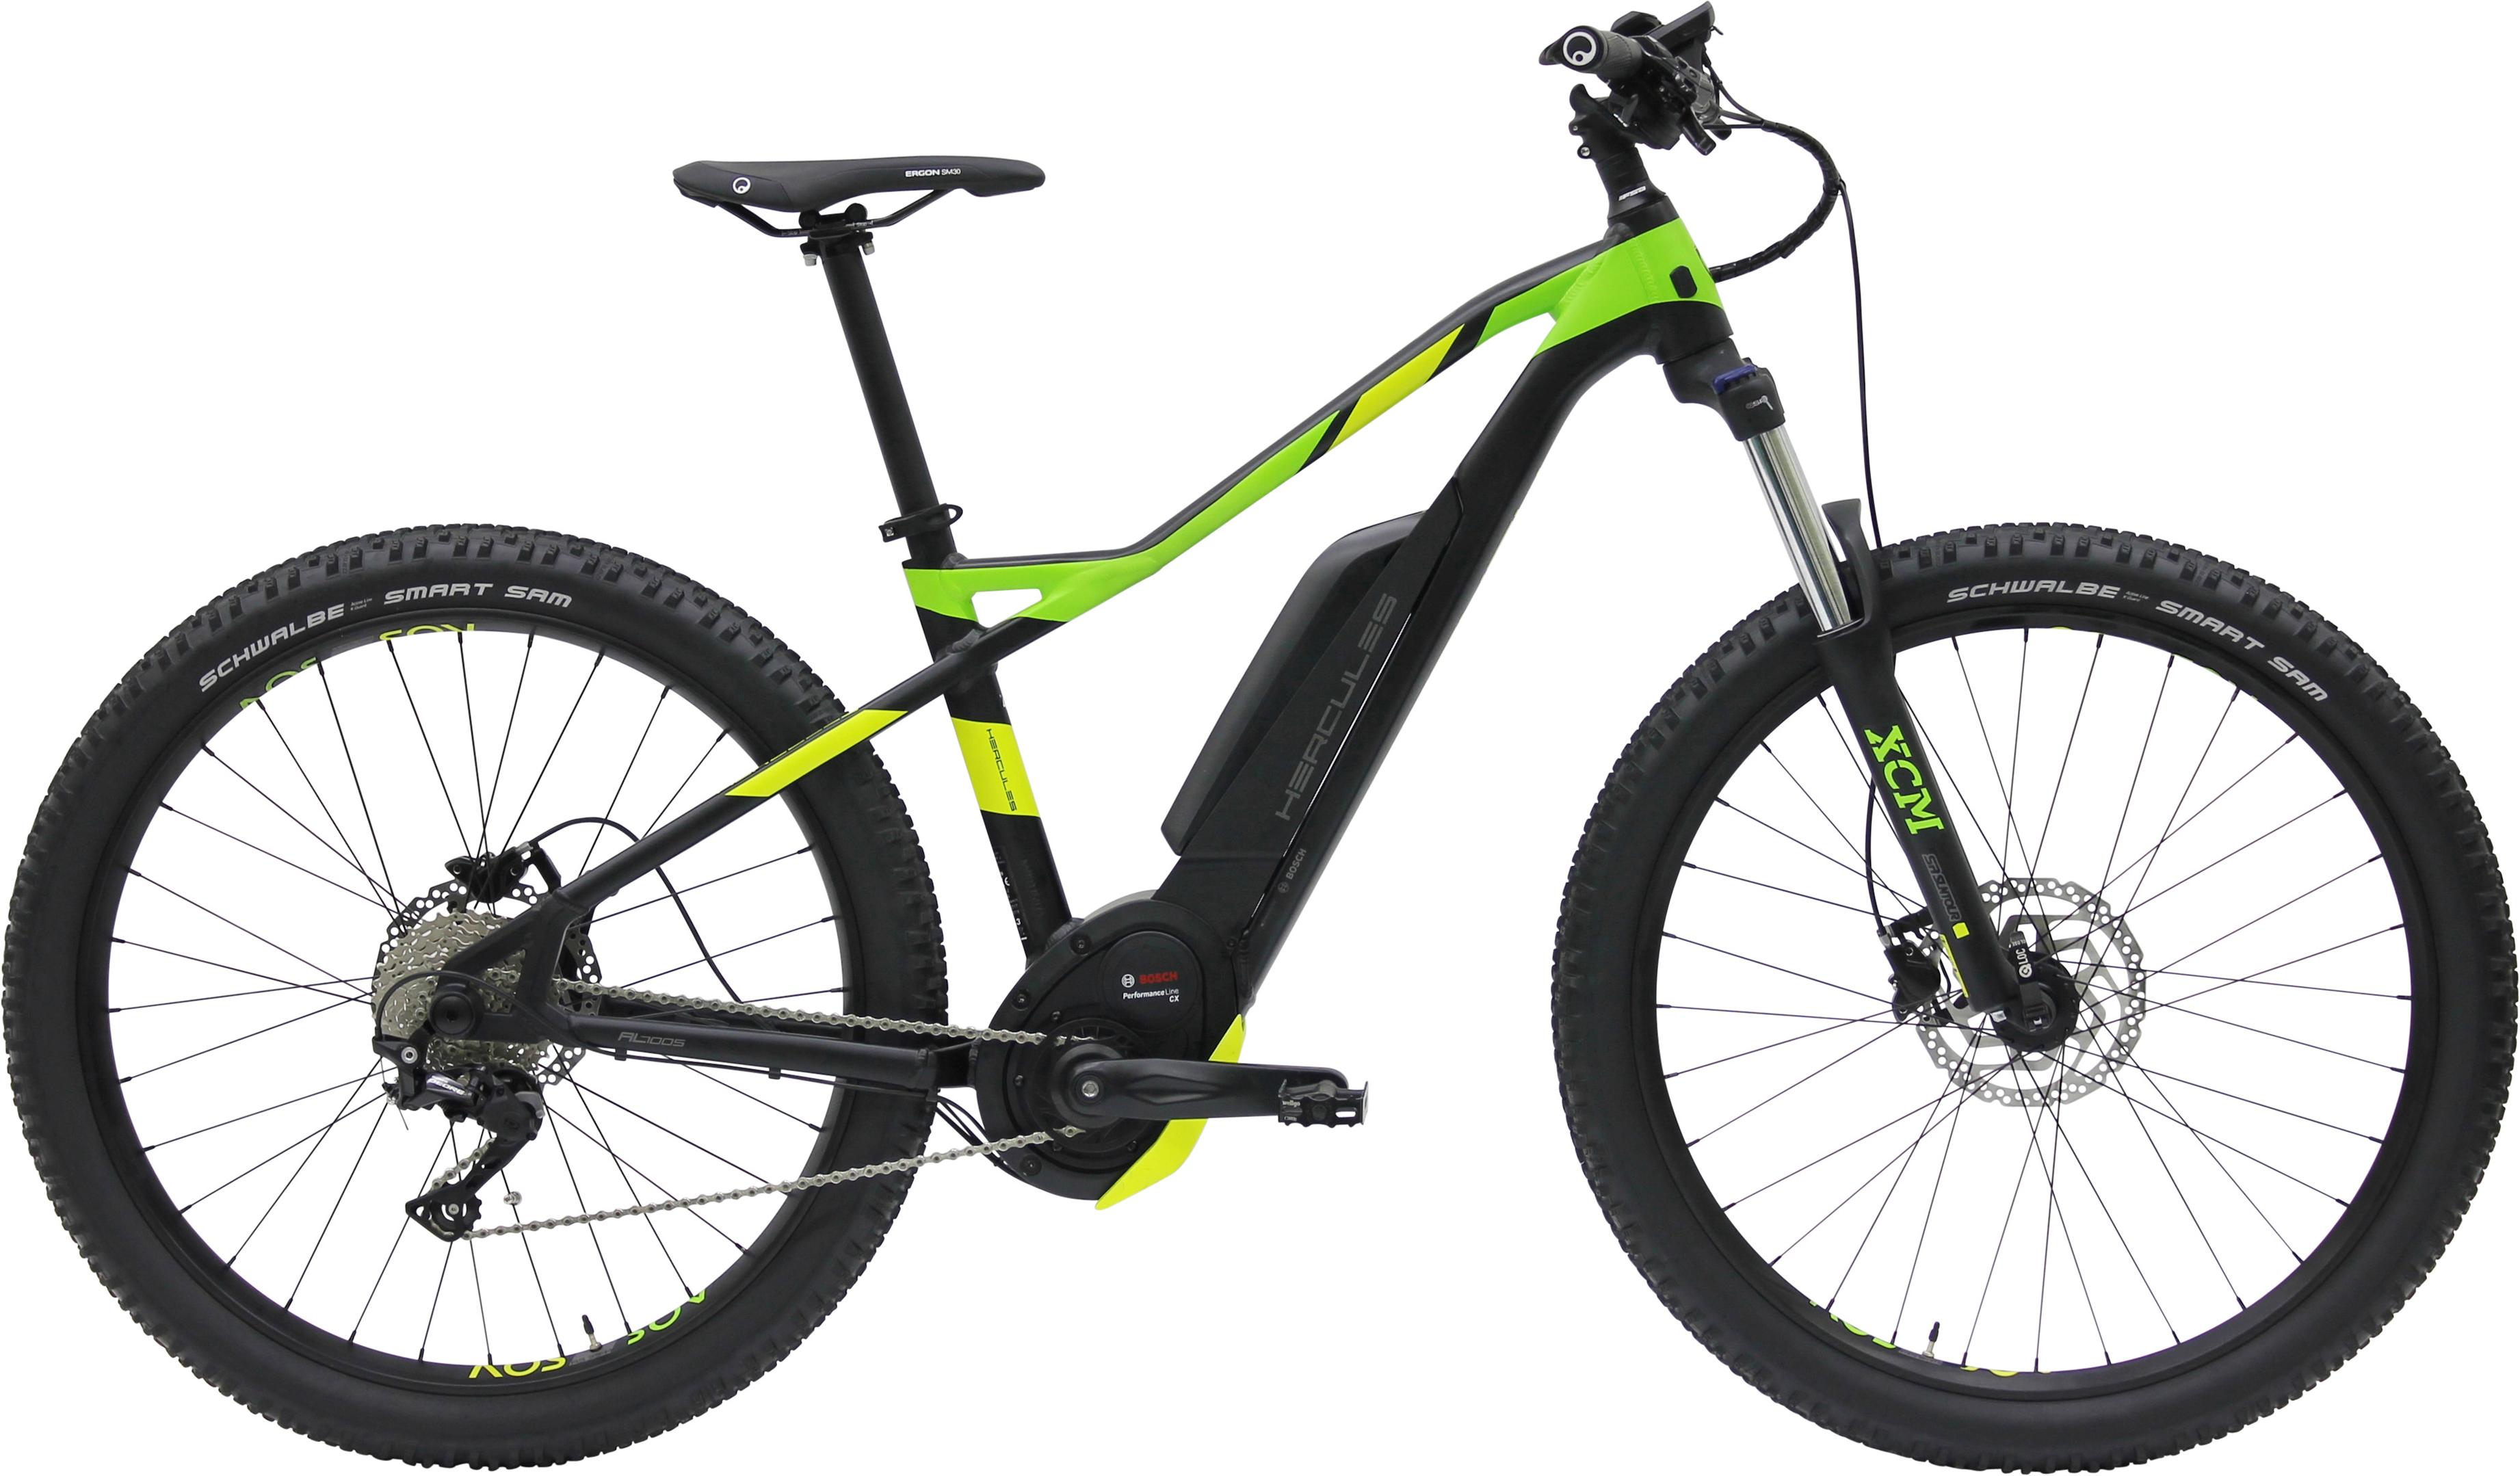 NOS CX SPORT 10sp bicicletta emtb